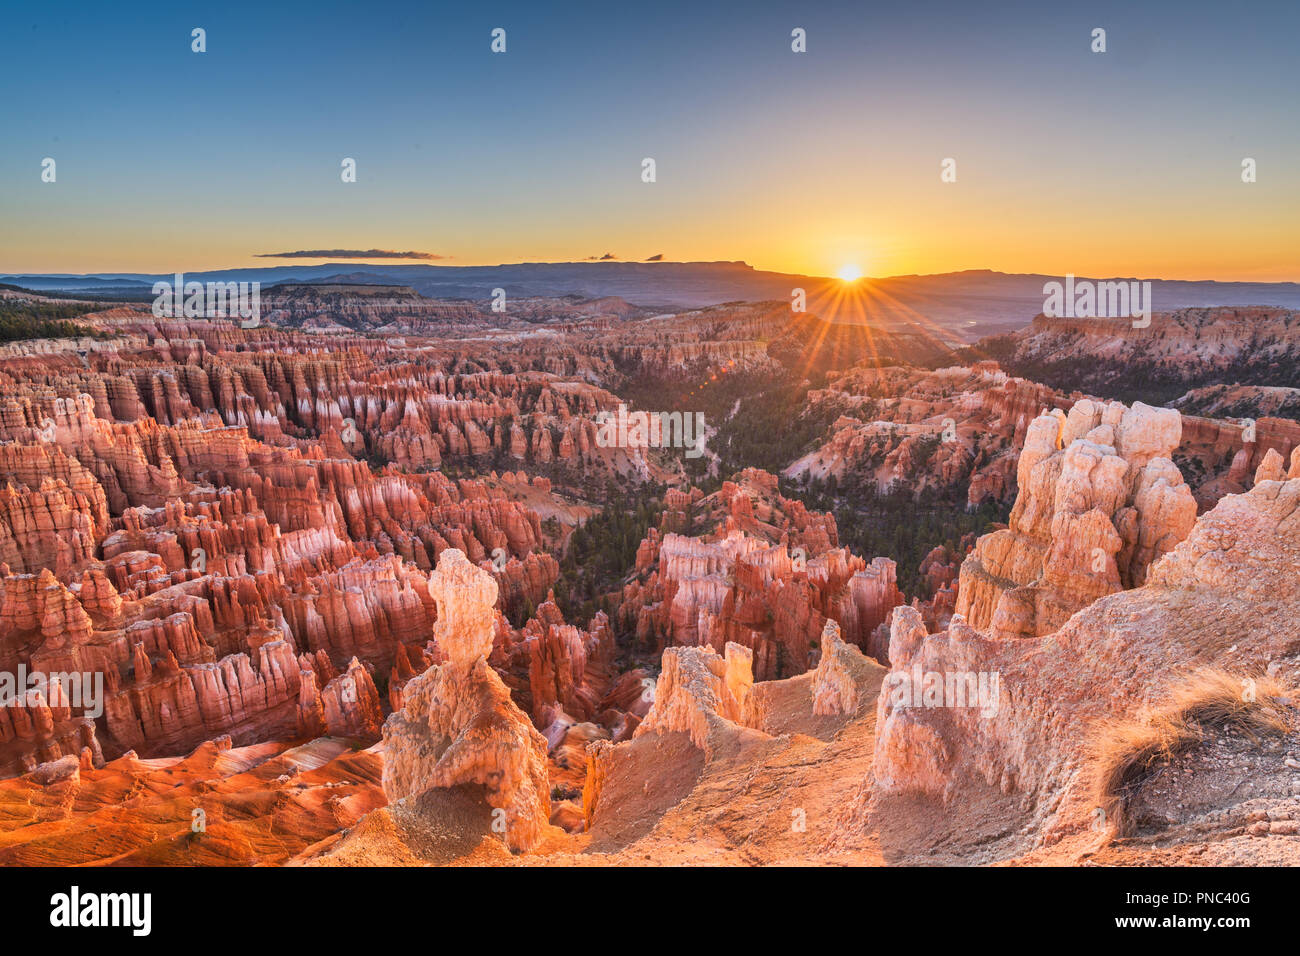 Parco Nazionale di Bryce Canyon, Utah, Stati Uniti d'America all'alba. Immagini Stock